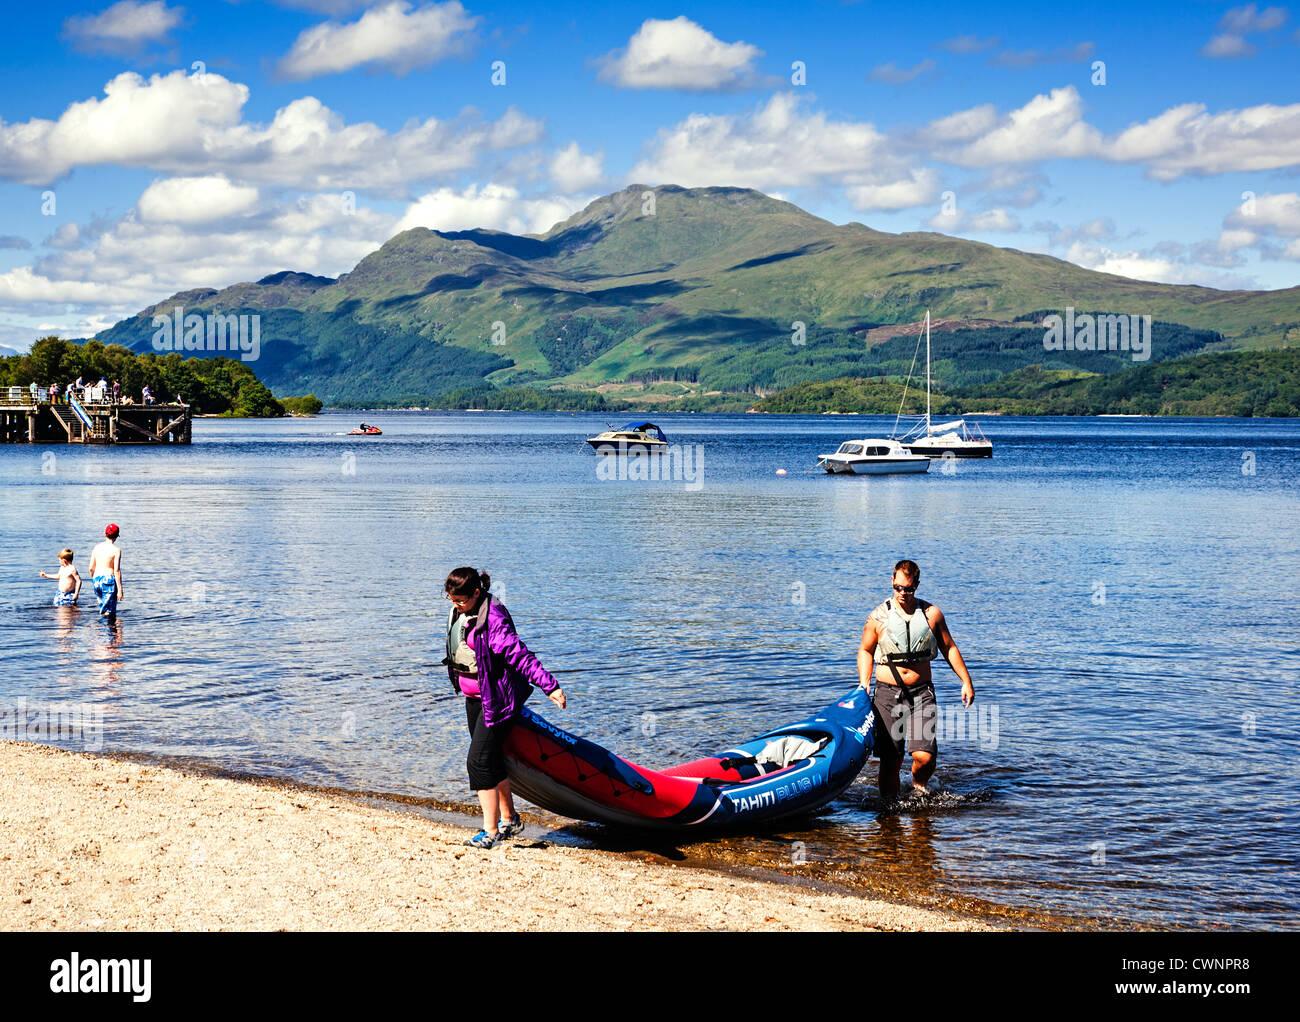 Luss beach in summer, Loch Lomond, Scotland. - Stock Image